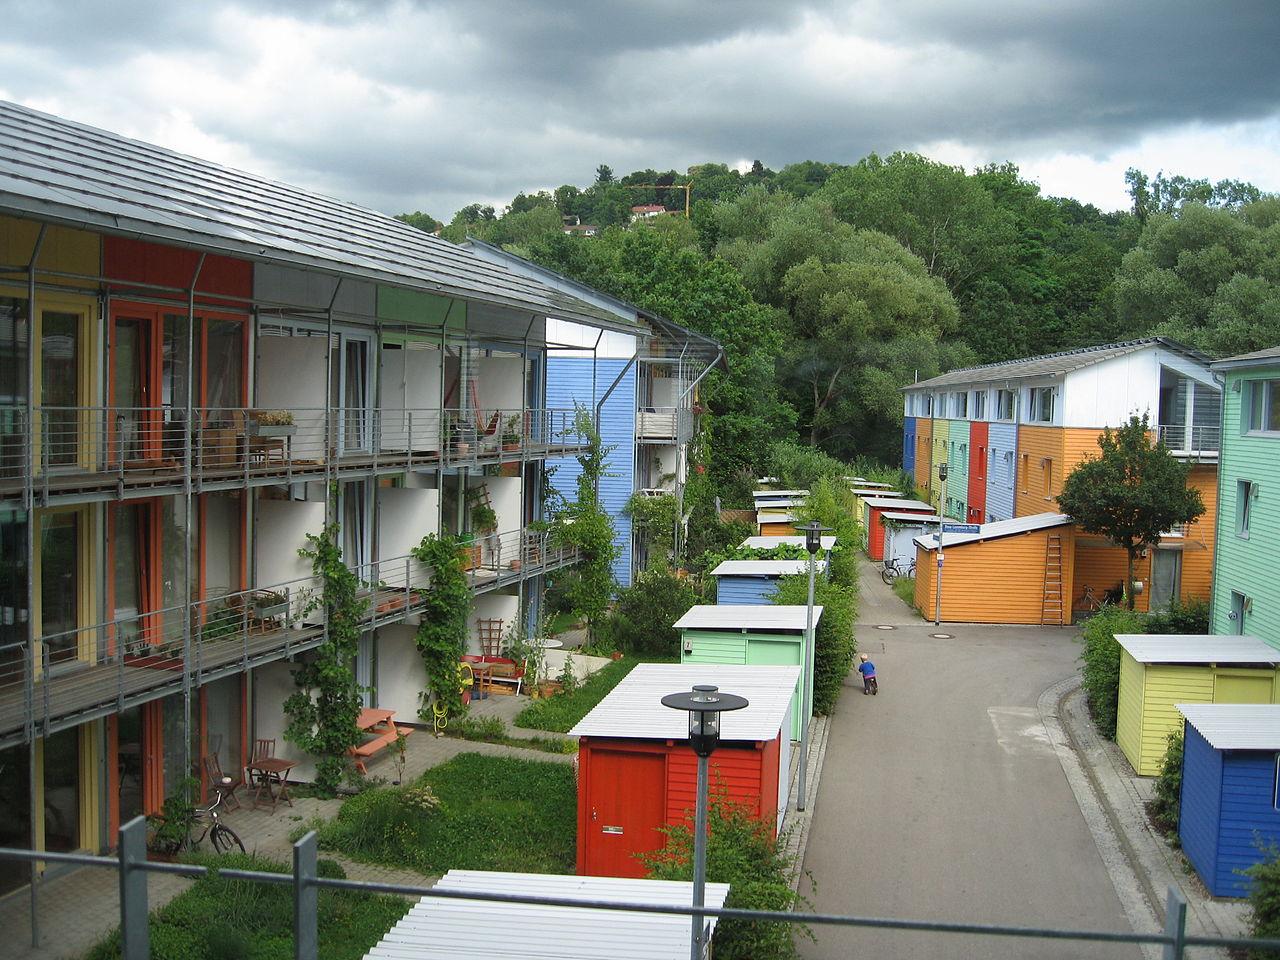 https://commons.wikimedia.org/wiki/File:%C3%89coquartier_vauban_freibourg1.JPG?uselang=de